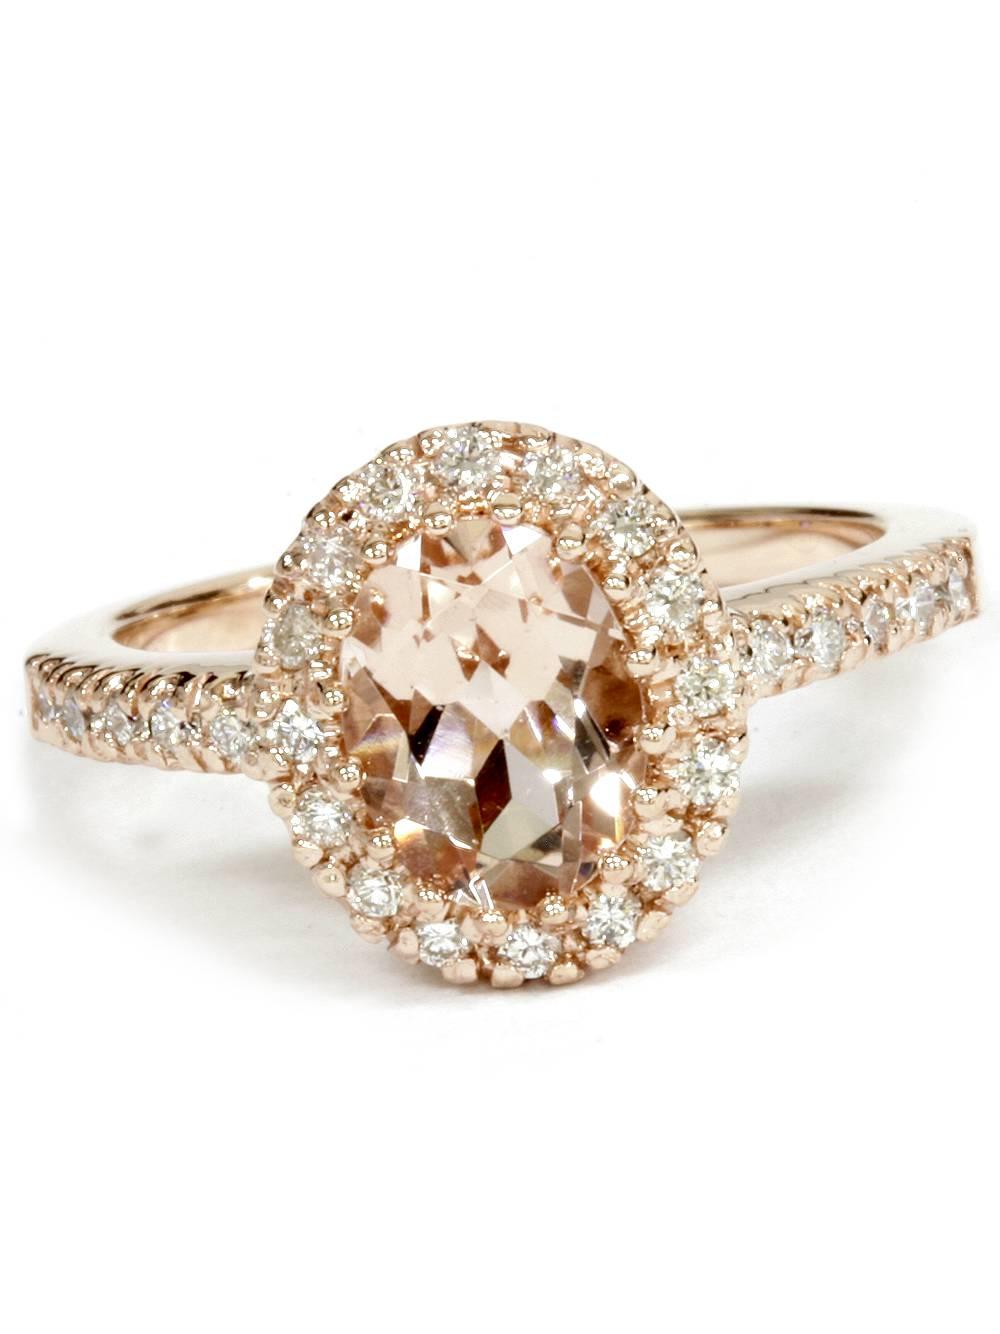 2.00Ct Oval Morganite & Diamond Halo Ring 14K Rose Gold